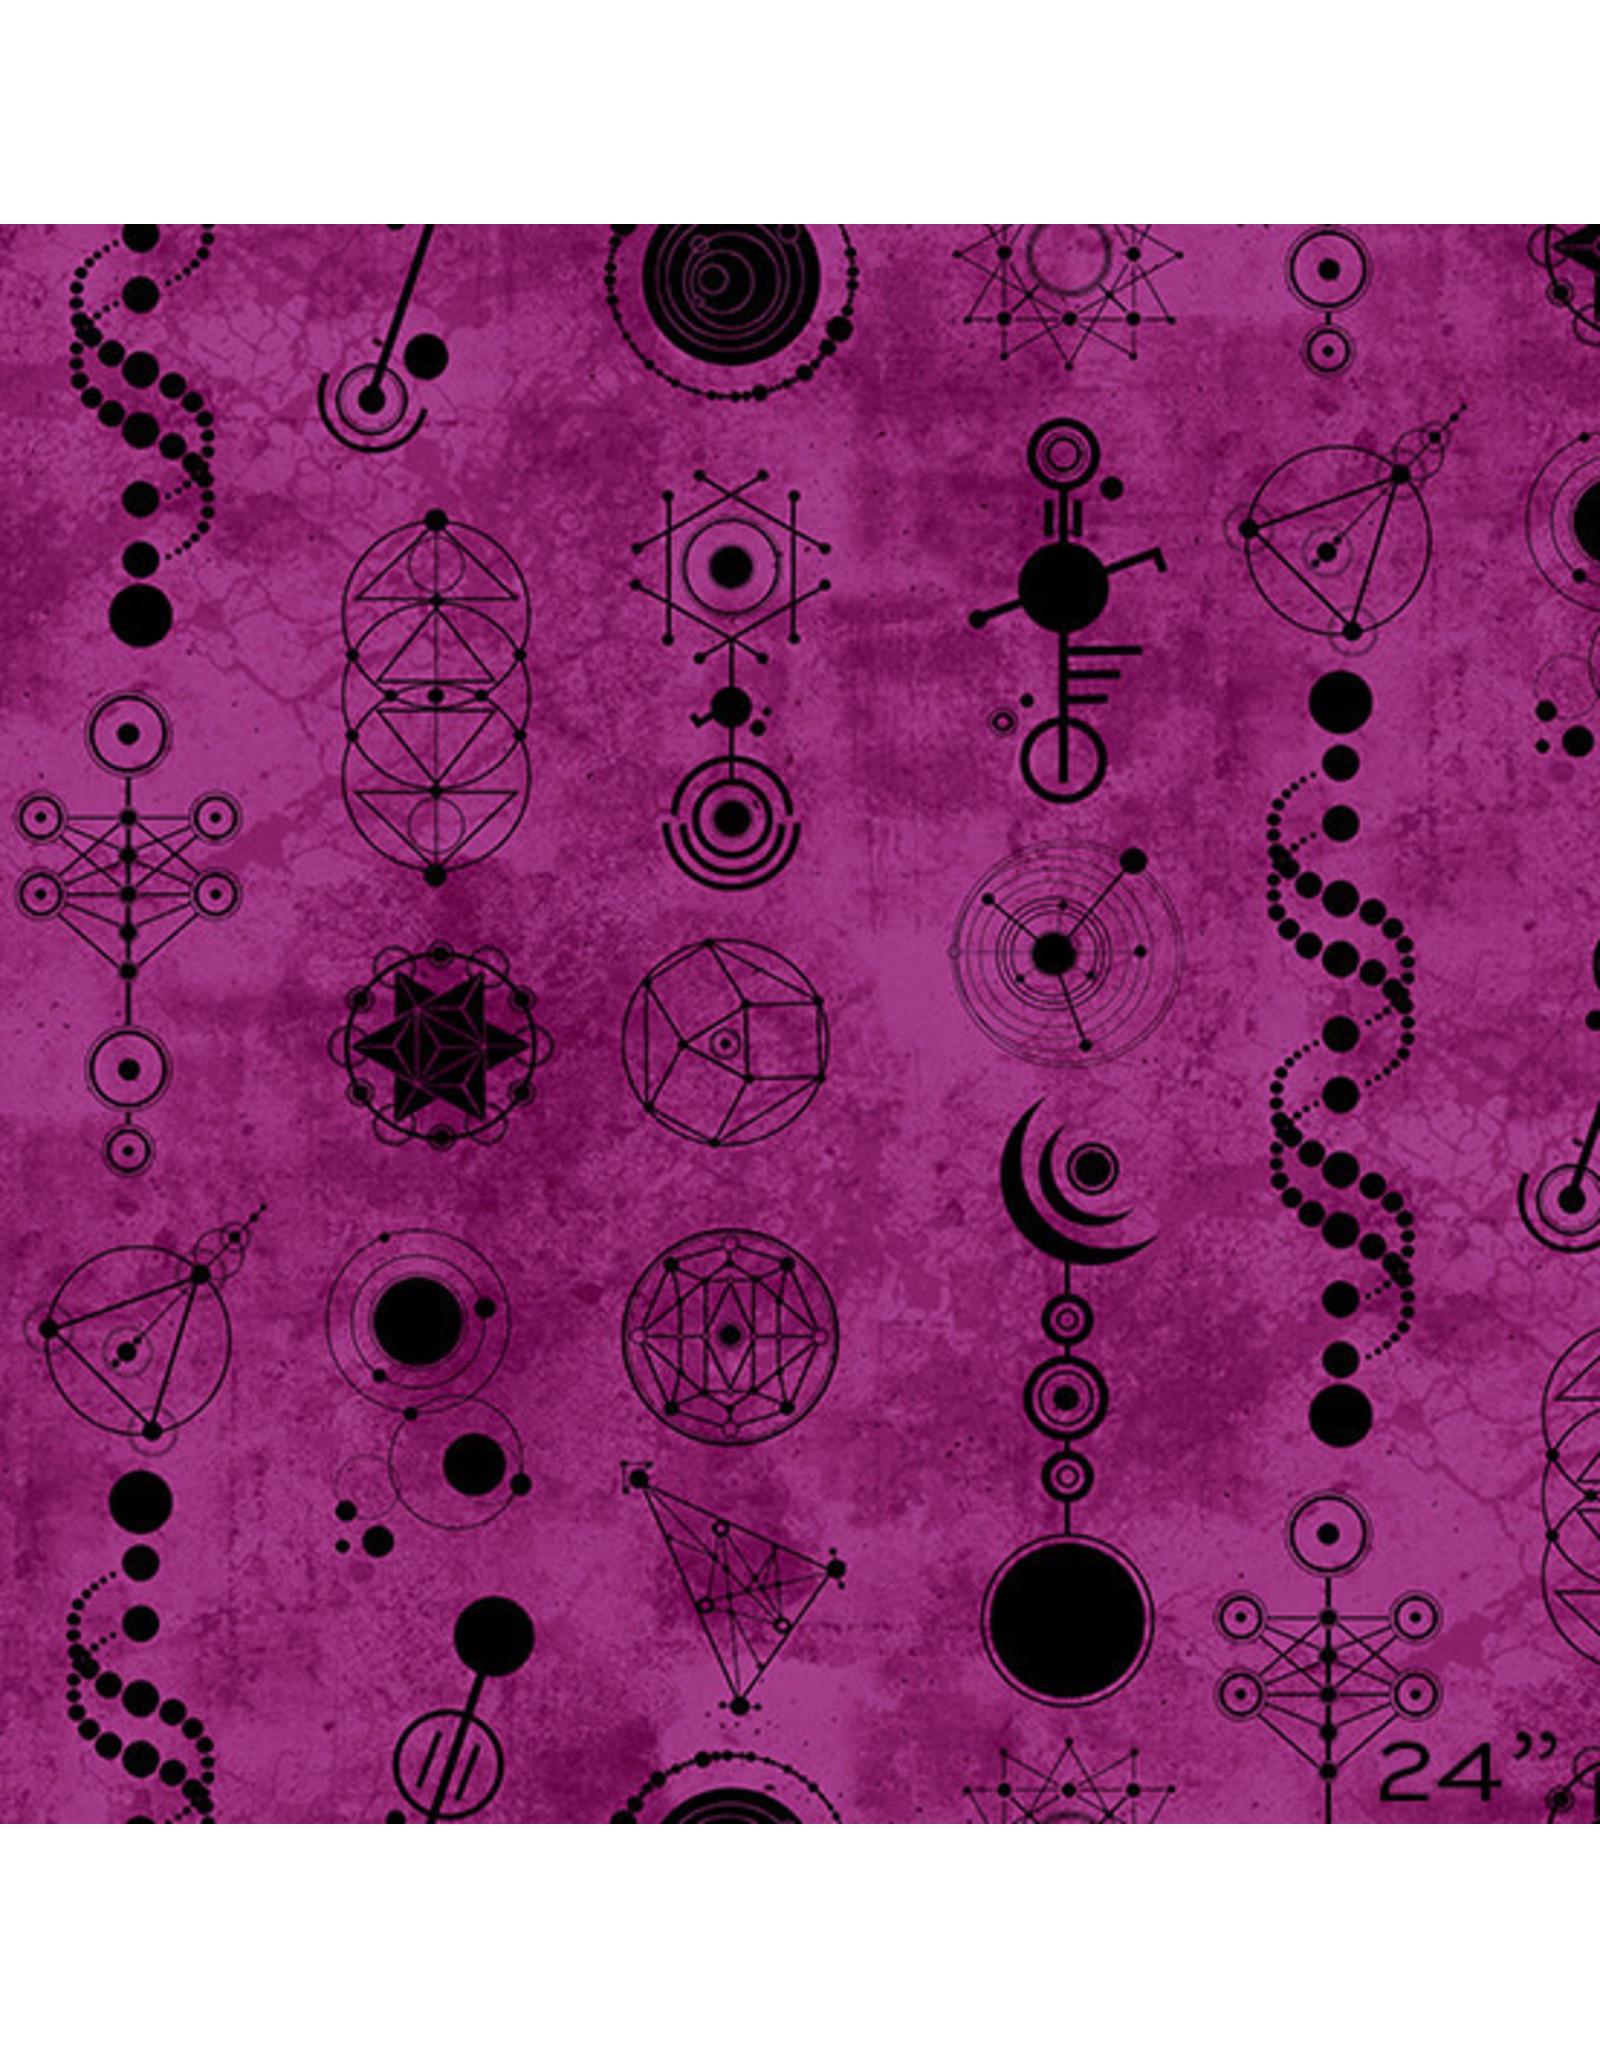 Andover Declassified - Crop Circles Amethyst coupon (± 24 x 110 cm)